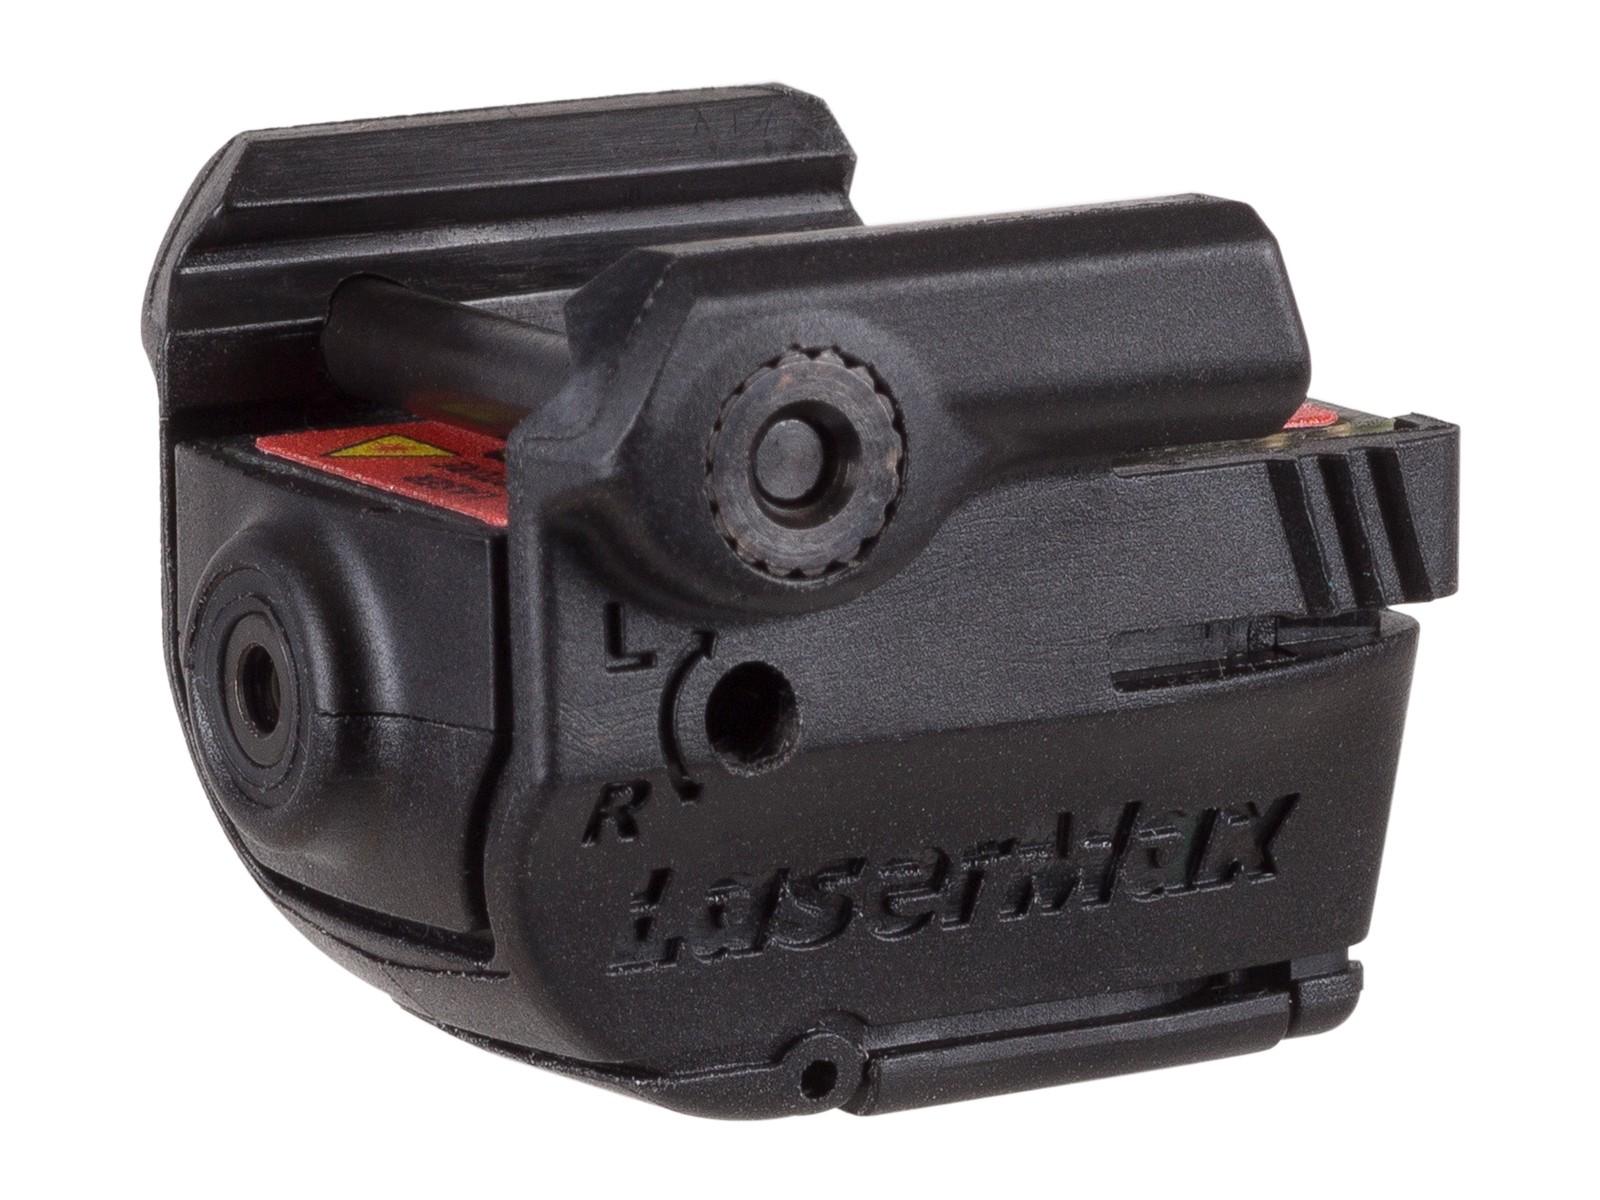 LaserMax Red Micro